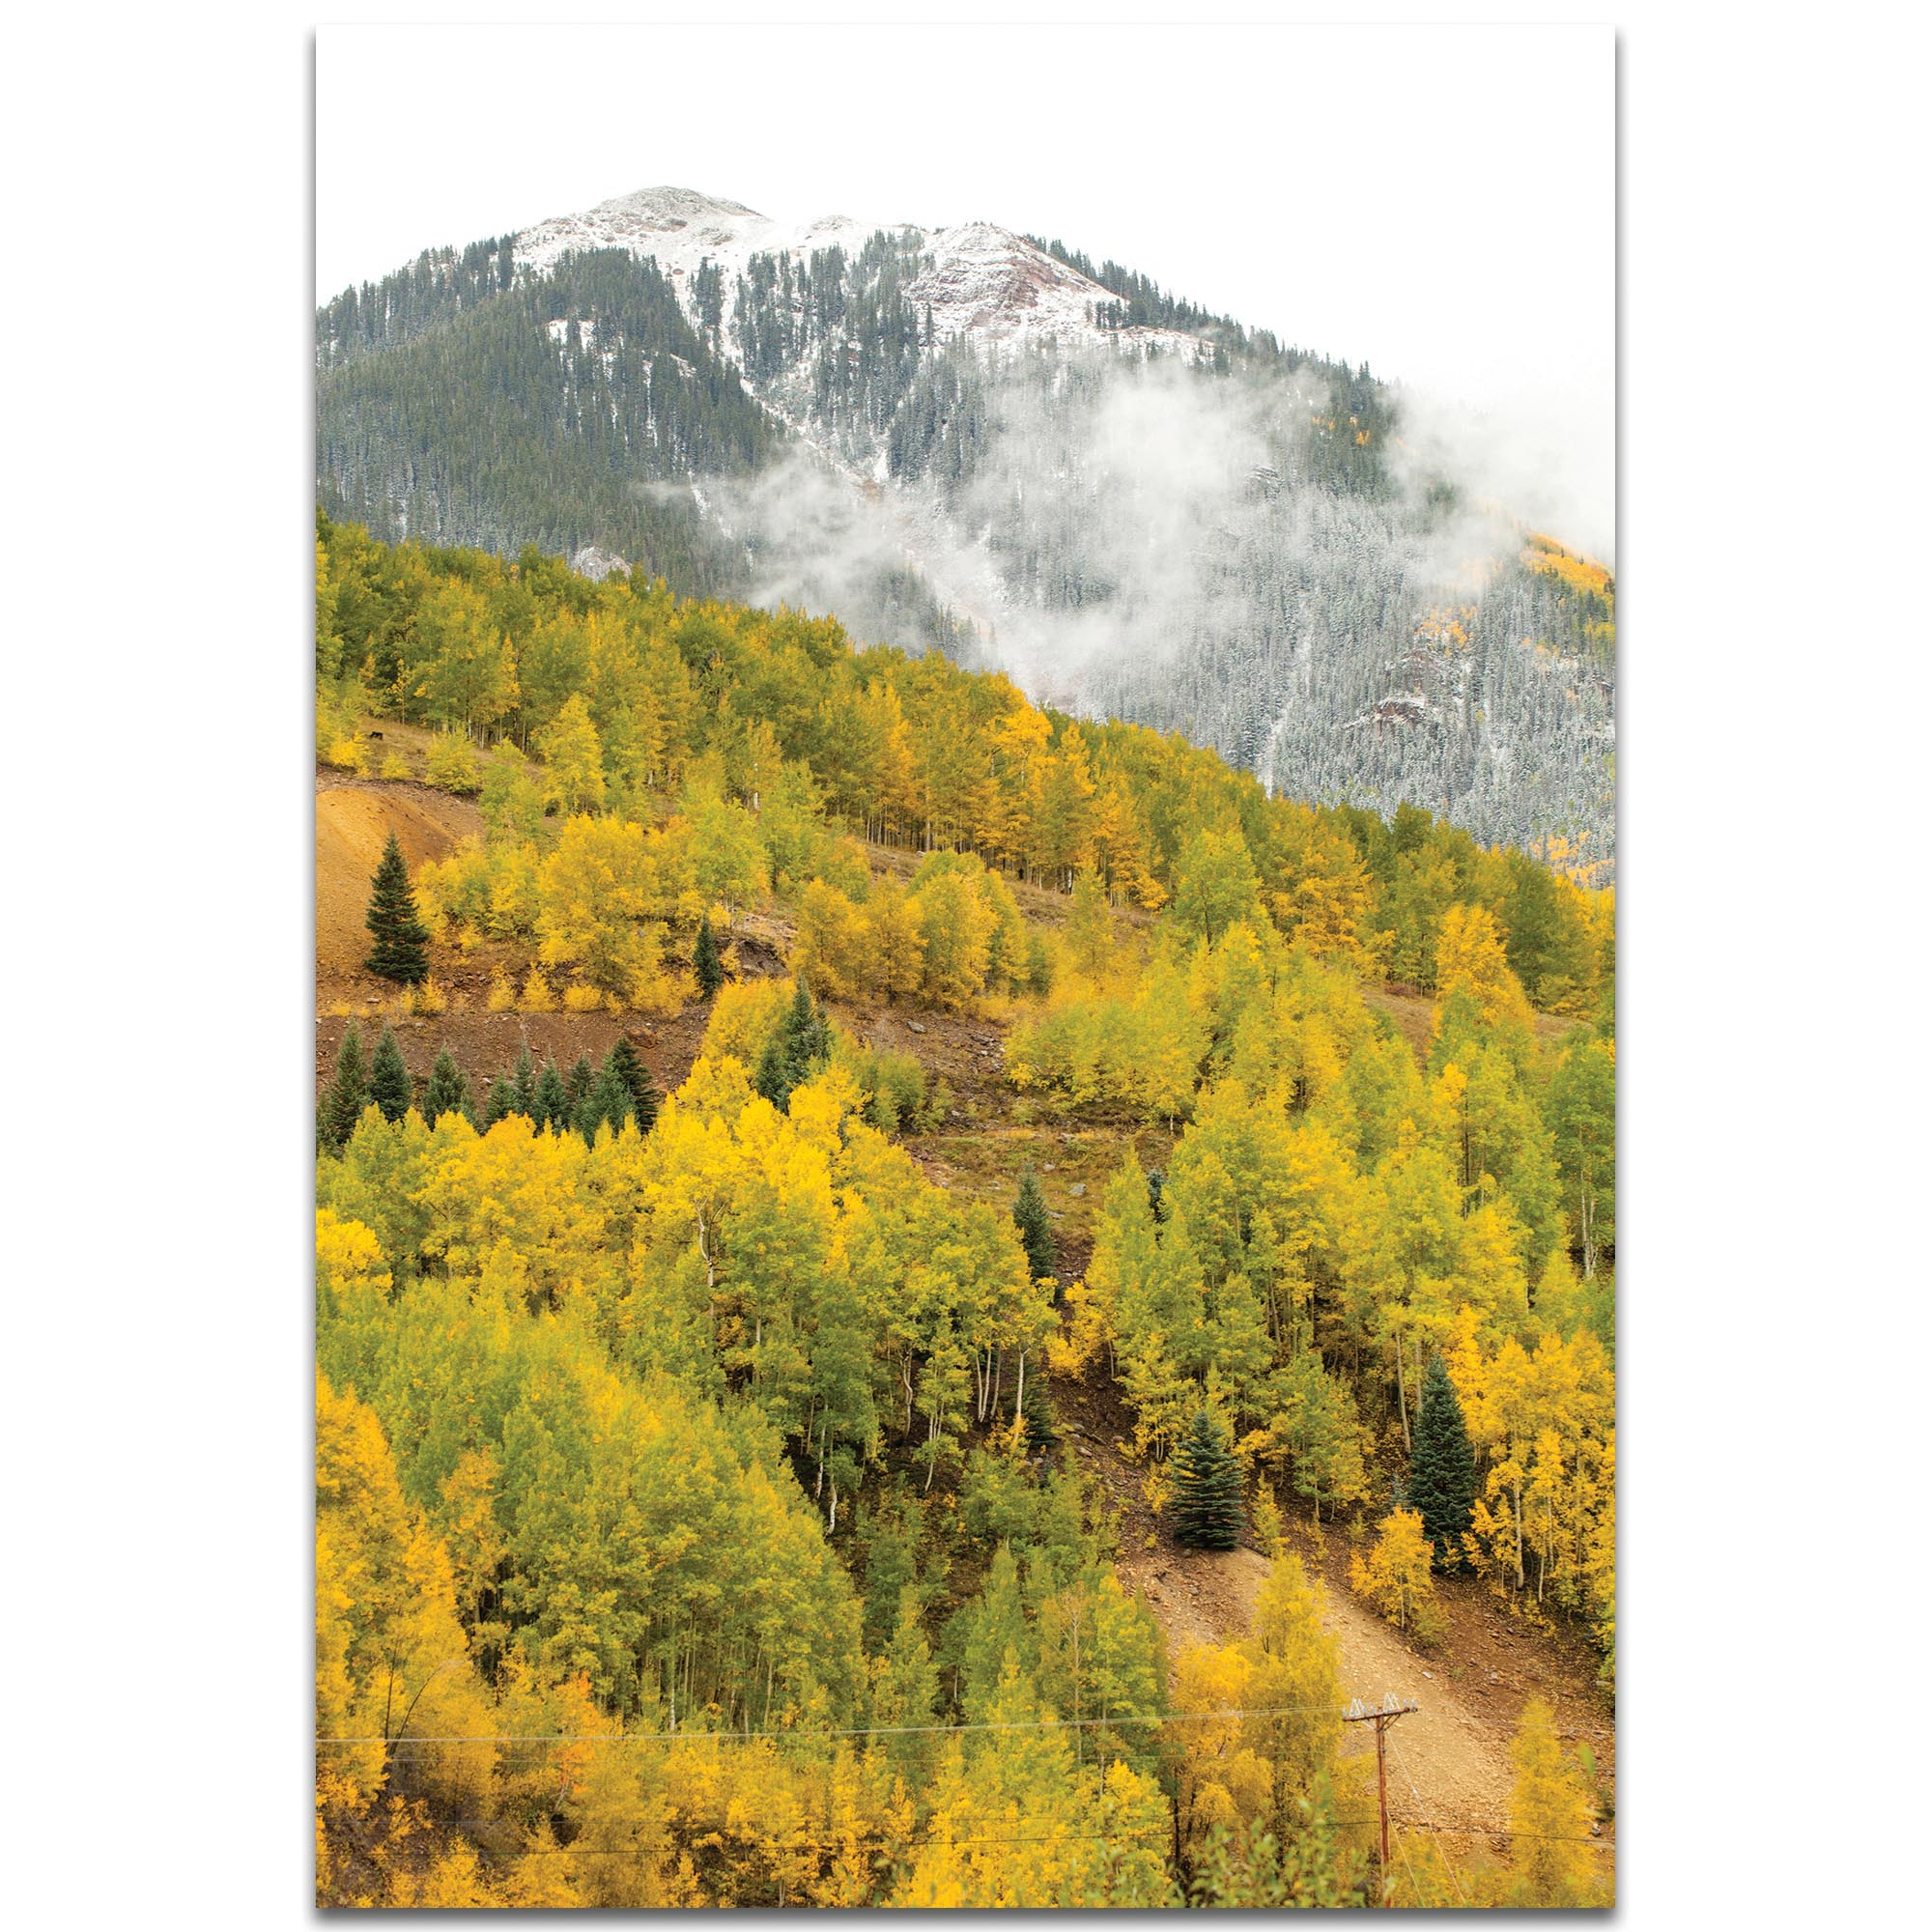 Landscape Photography 'Changing Season' - Autumn Nature Art on Metal or Plexiglass